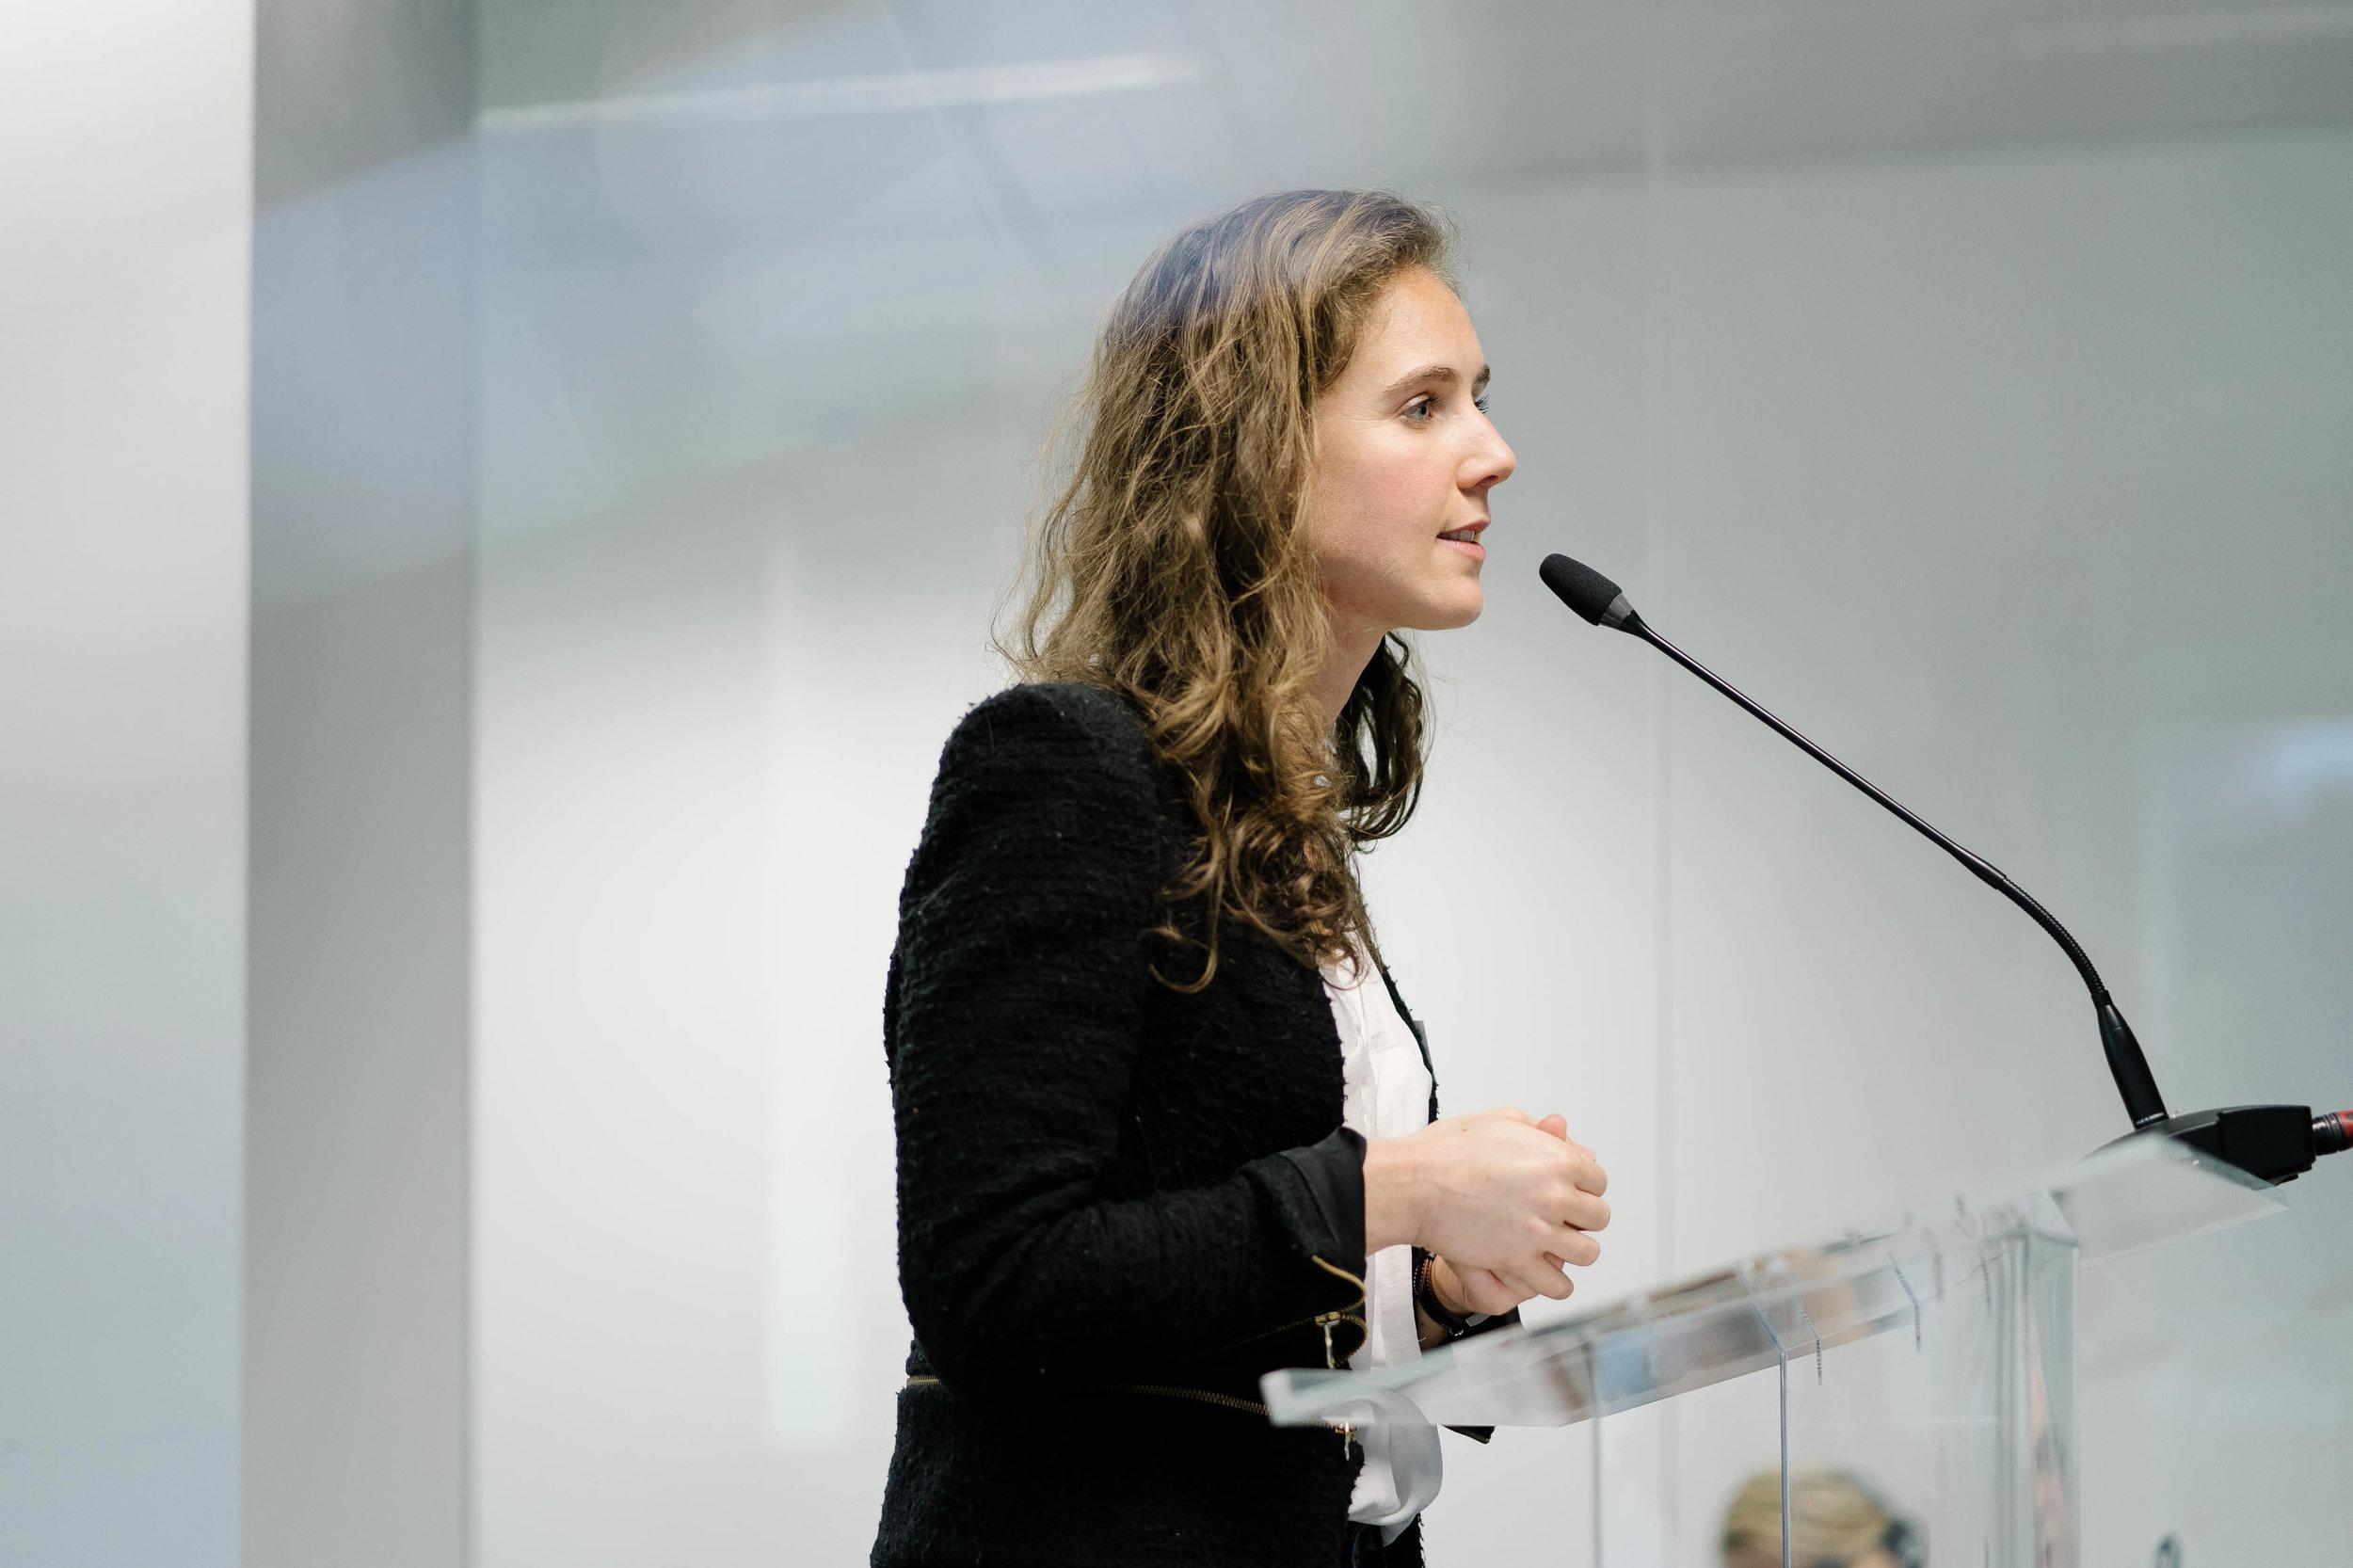 photographe-conference-bruxelles-corporate-28.jpg